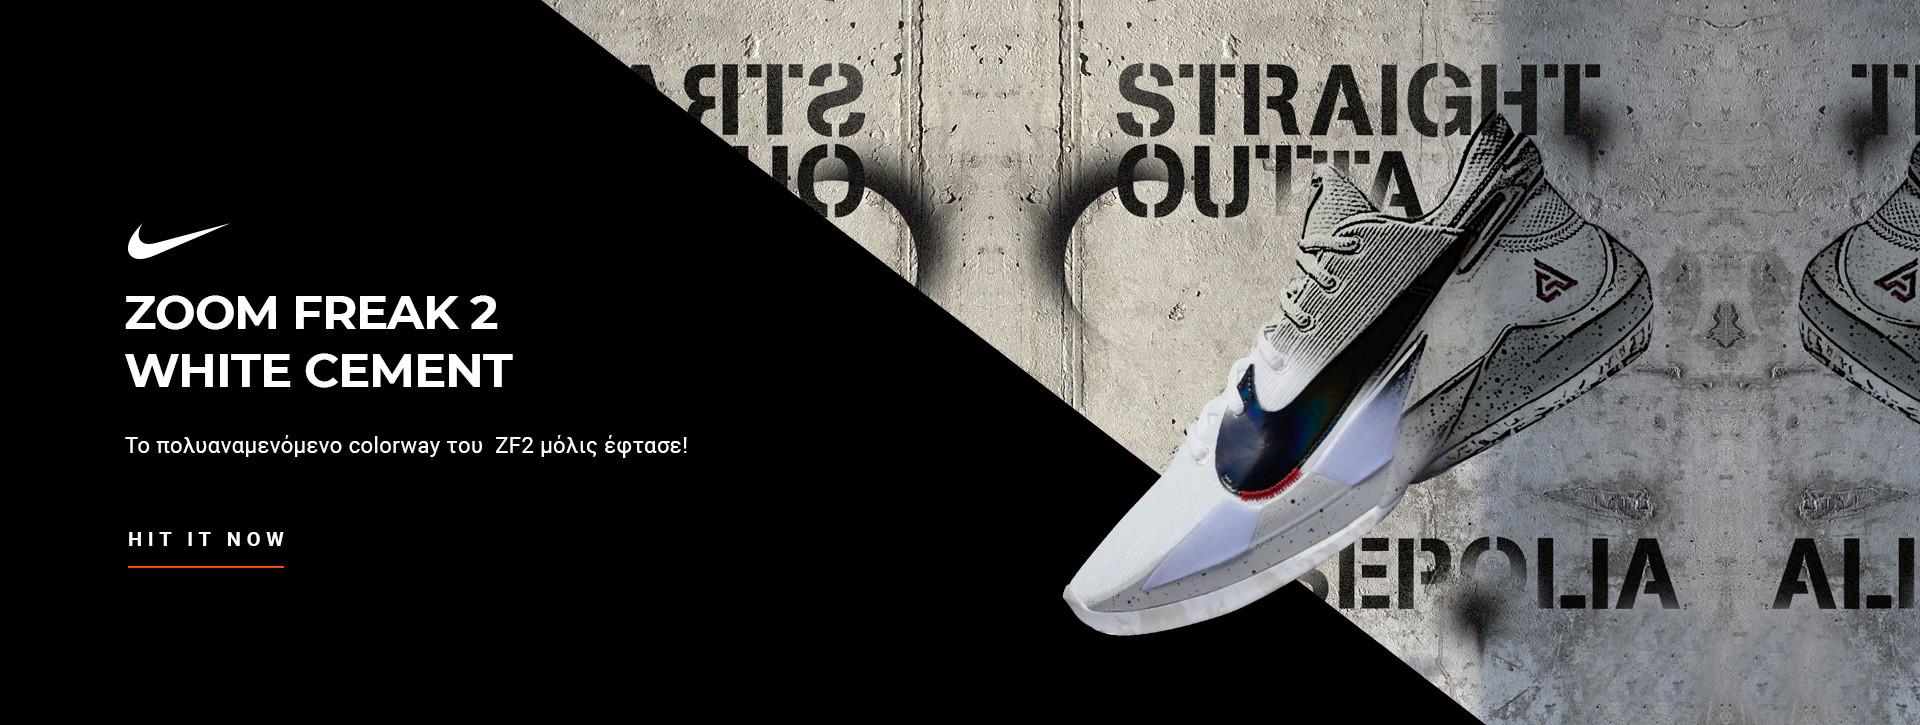 Nike Zoom Freak 2  - White Cement